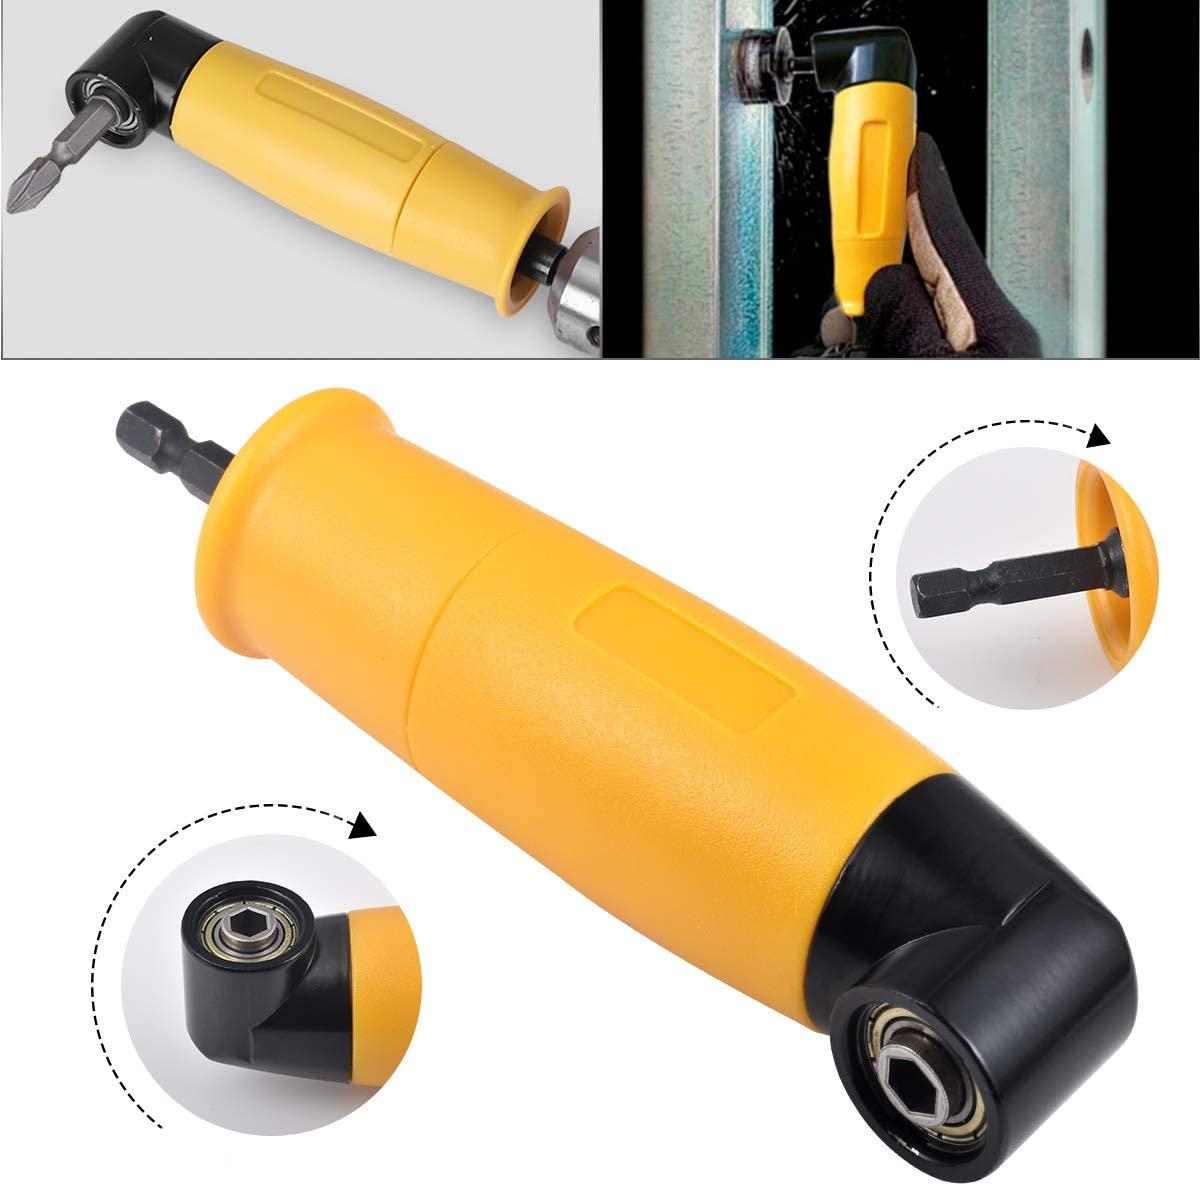 HOHXEN Right Angle Drill, 90 Degree Right Angle Driver Angle Extension Power Screwdriver Drill Attachment 1/4inch Hex Bit Socket Screwdriver Holder Adapter